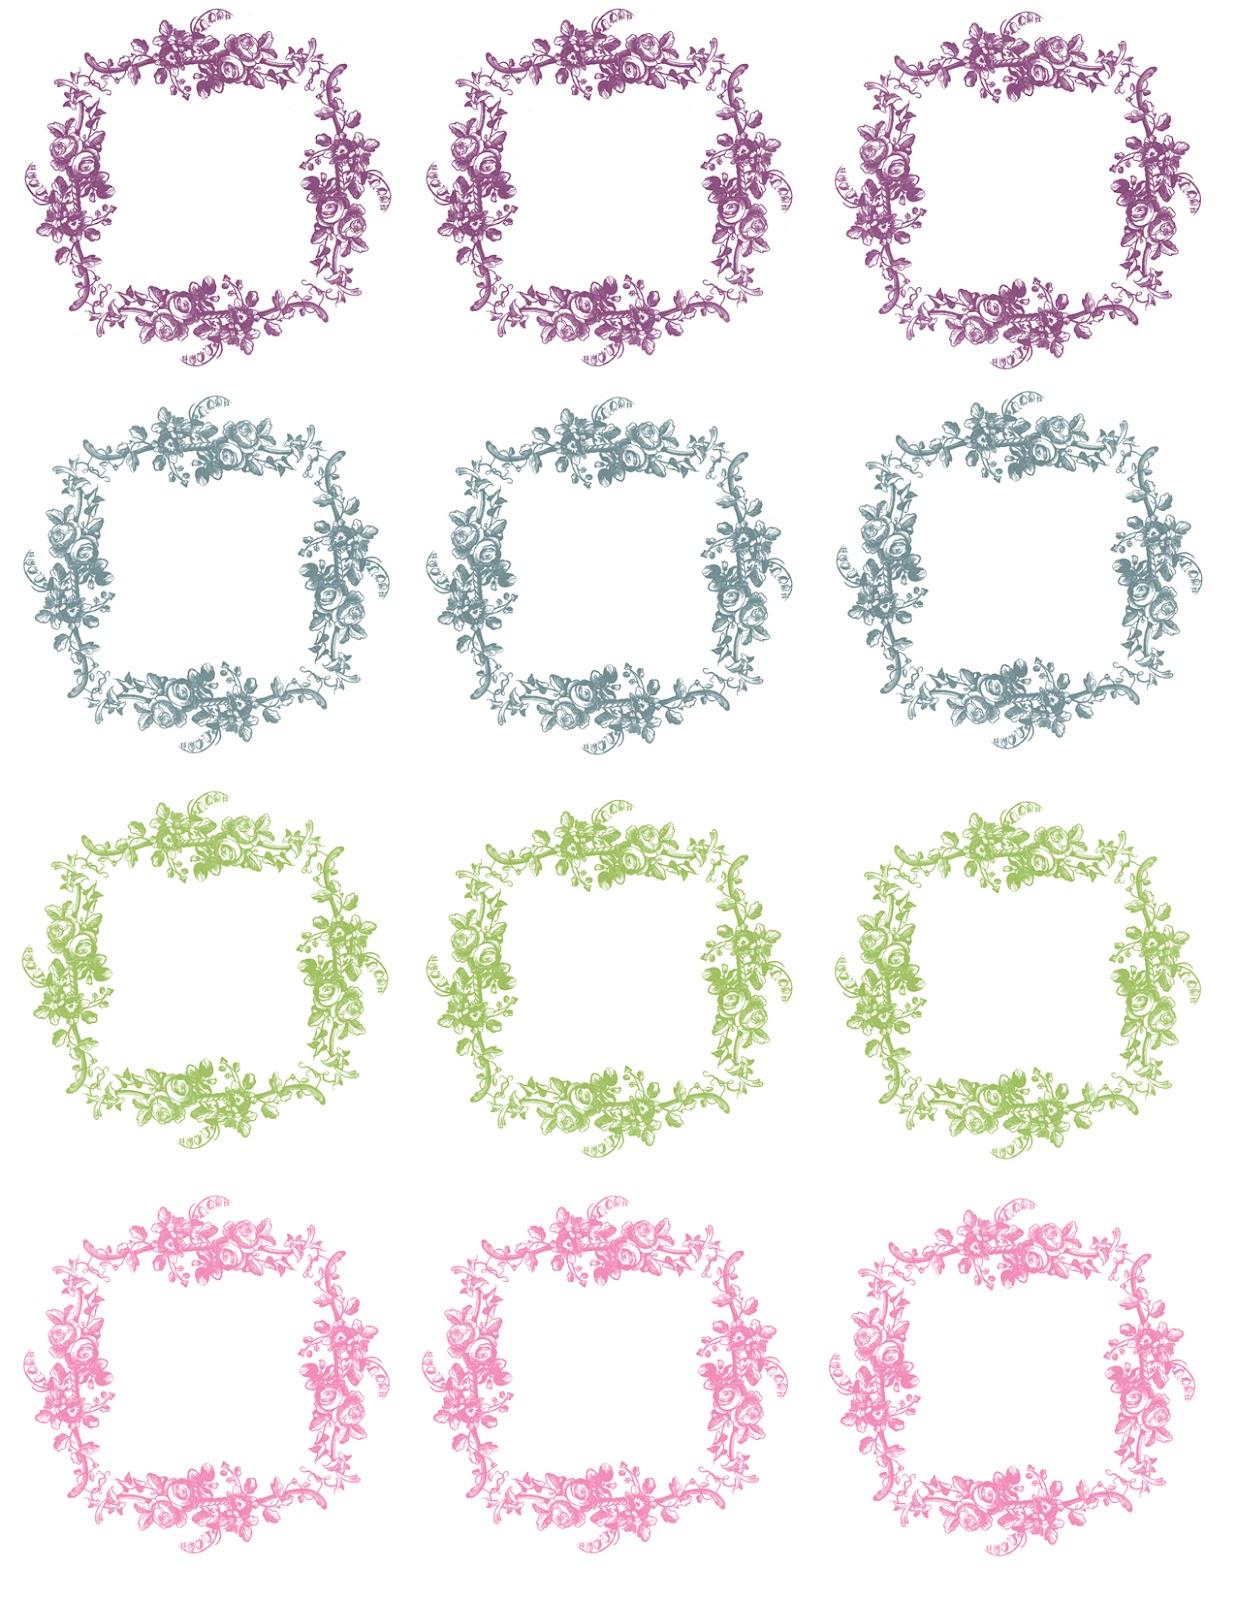 Graphics Fairy Printables